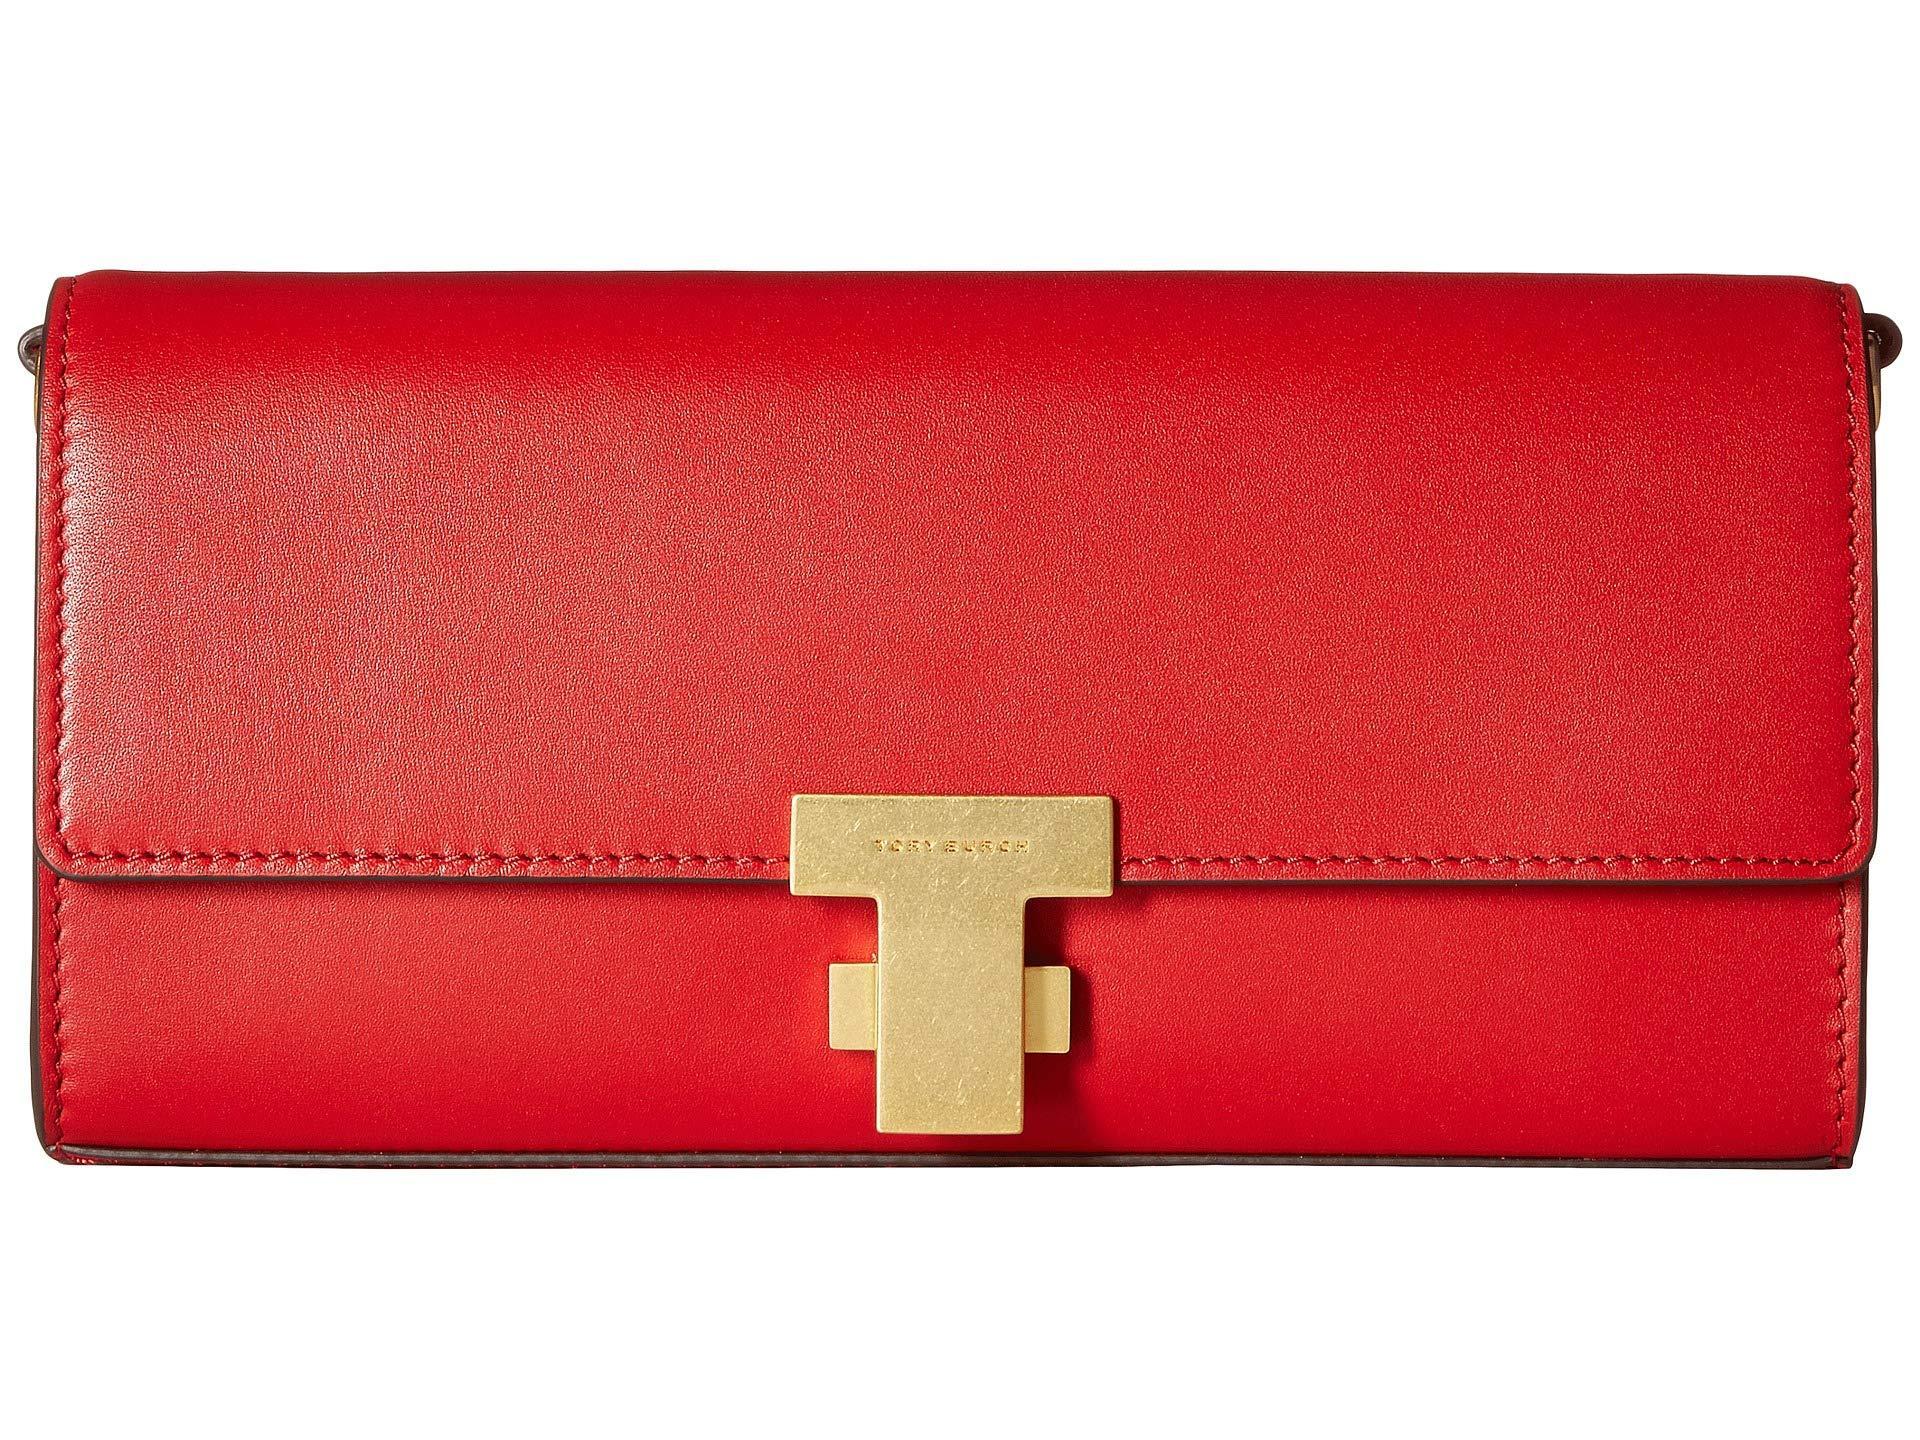 Lyst Tory Burch Juliette Clutch Black Clutch Handbags In Red